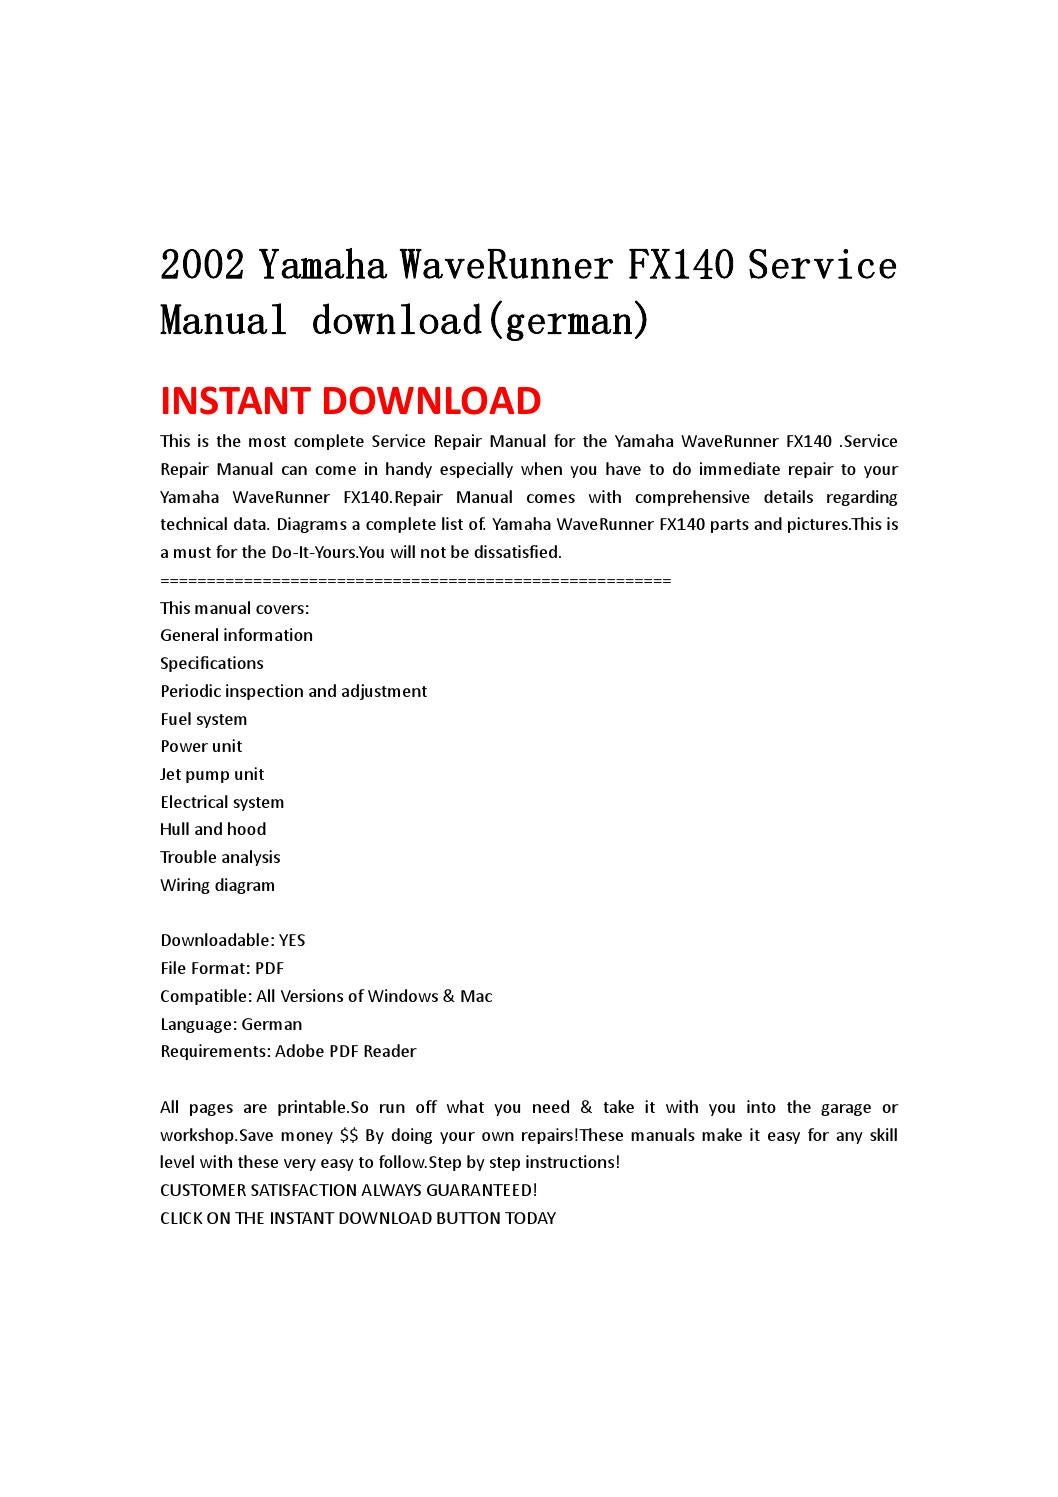 2002 Yamaha Waverunner Fx140 Service Manual Download